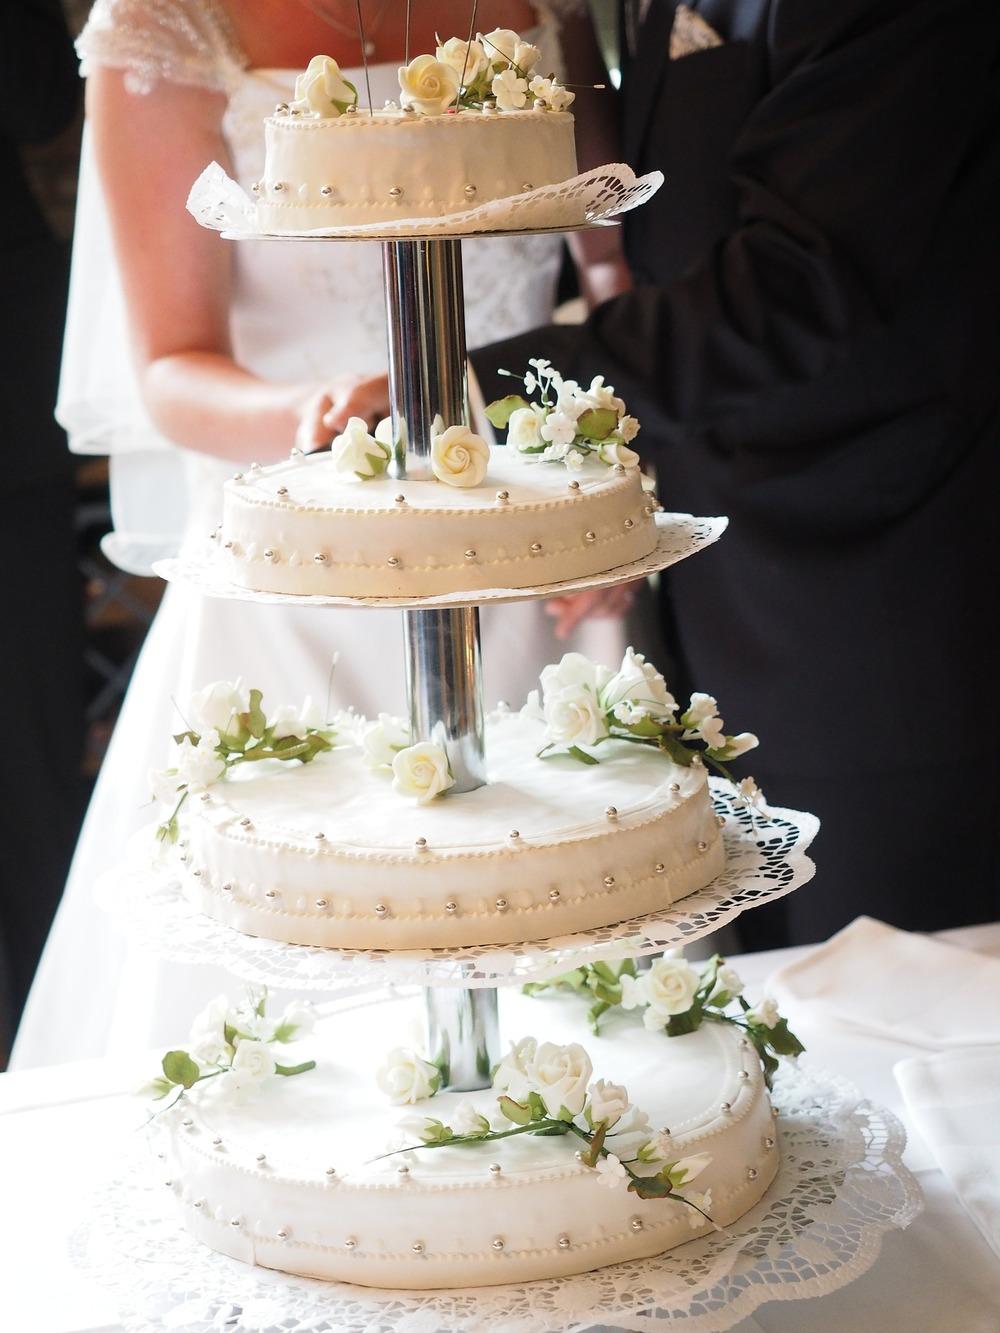 cake-590774_1920.jpg